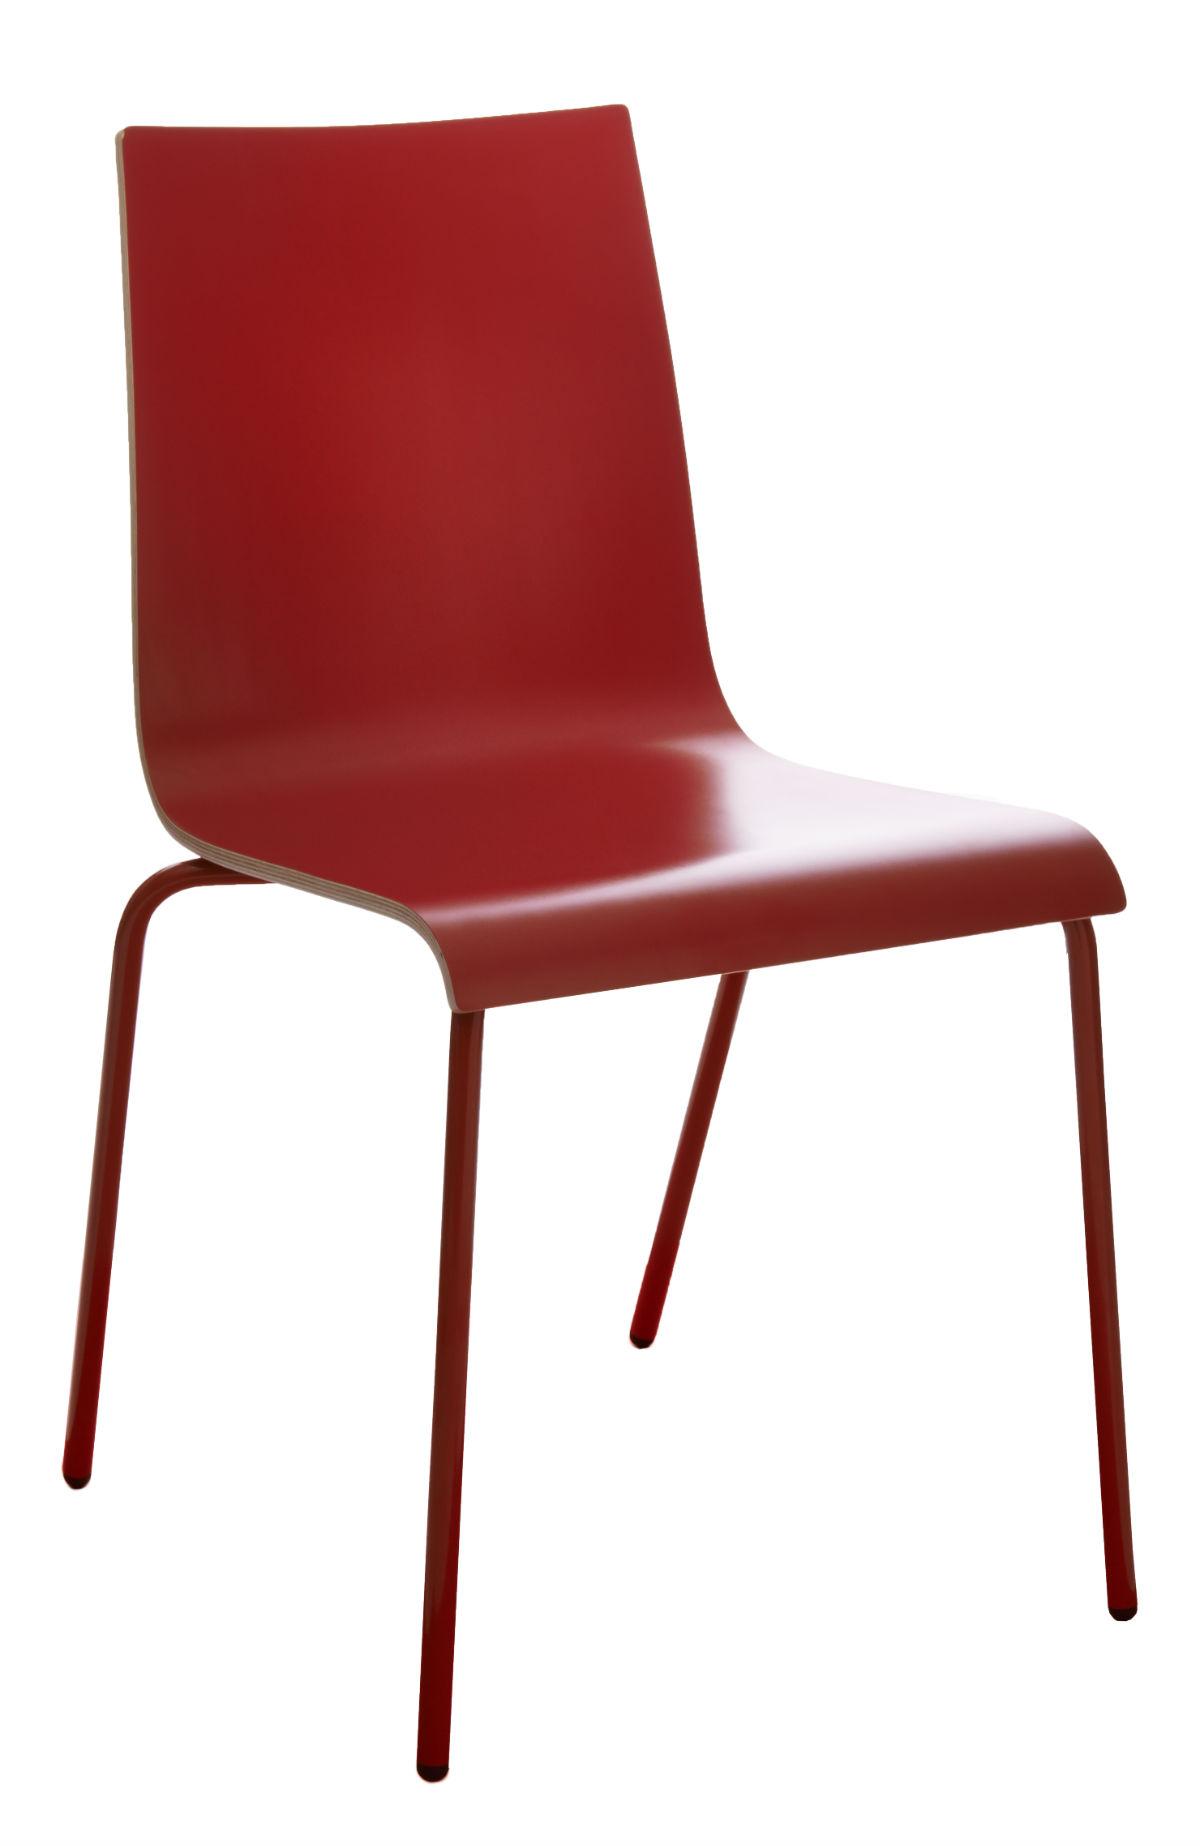 Alerte rouge guten morgwen - Chaise gruyere transparente ...